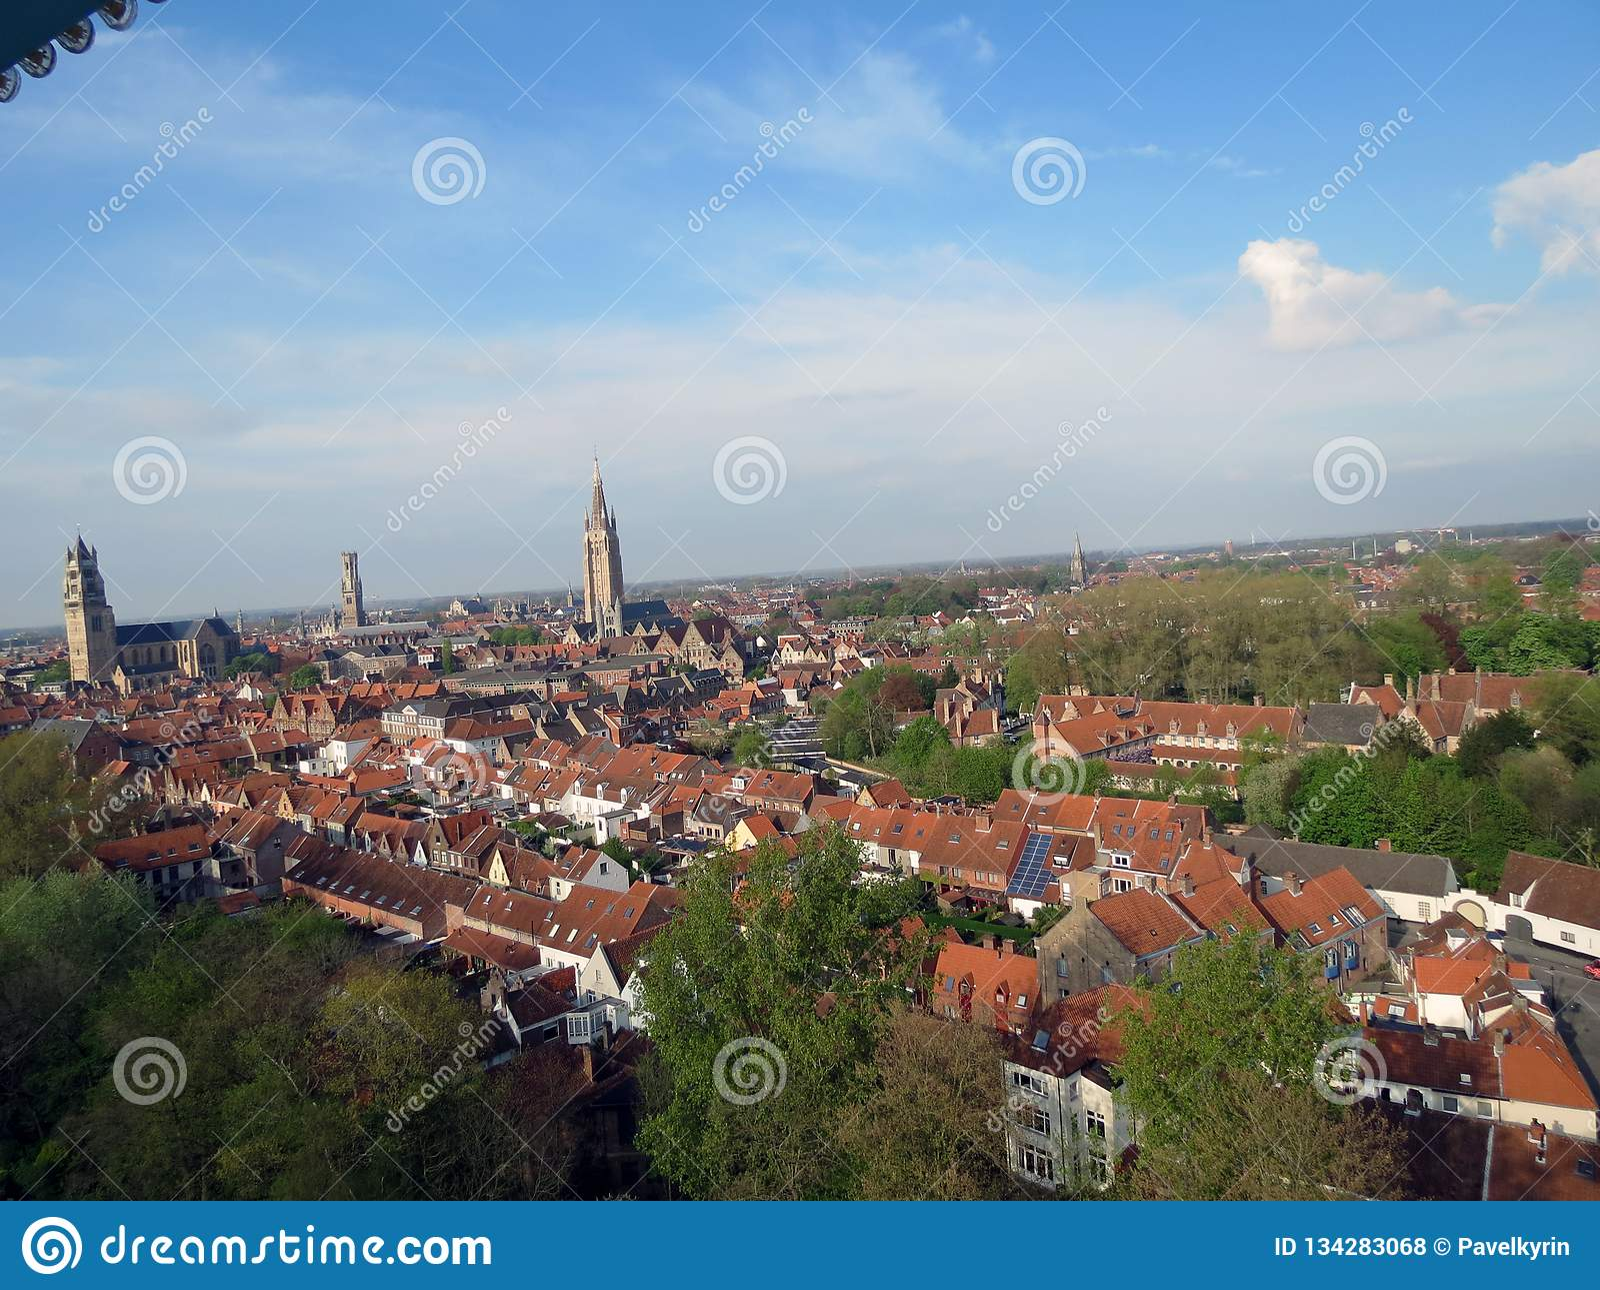 Europa, Belgien, Westflandern, Brügge, zentraler Stadtteil, Vogelschau